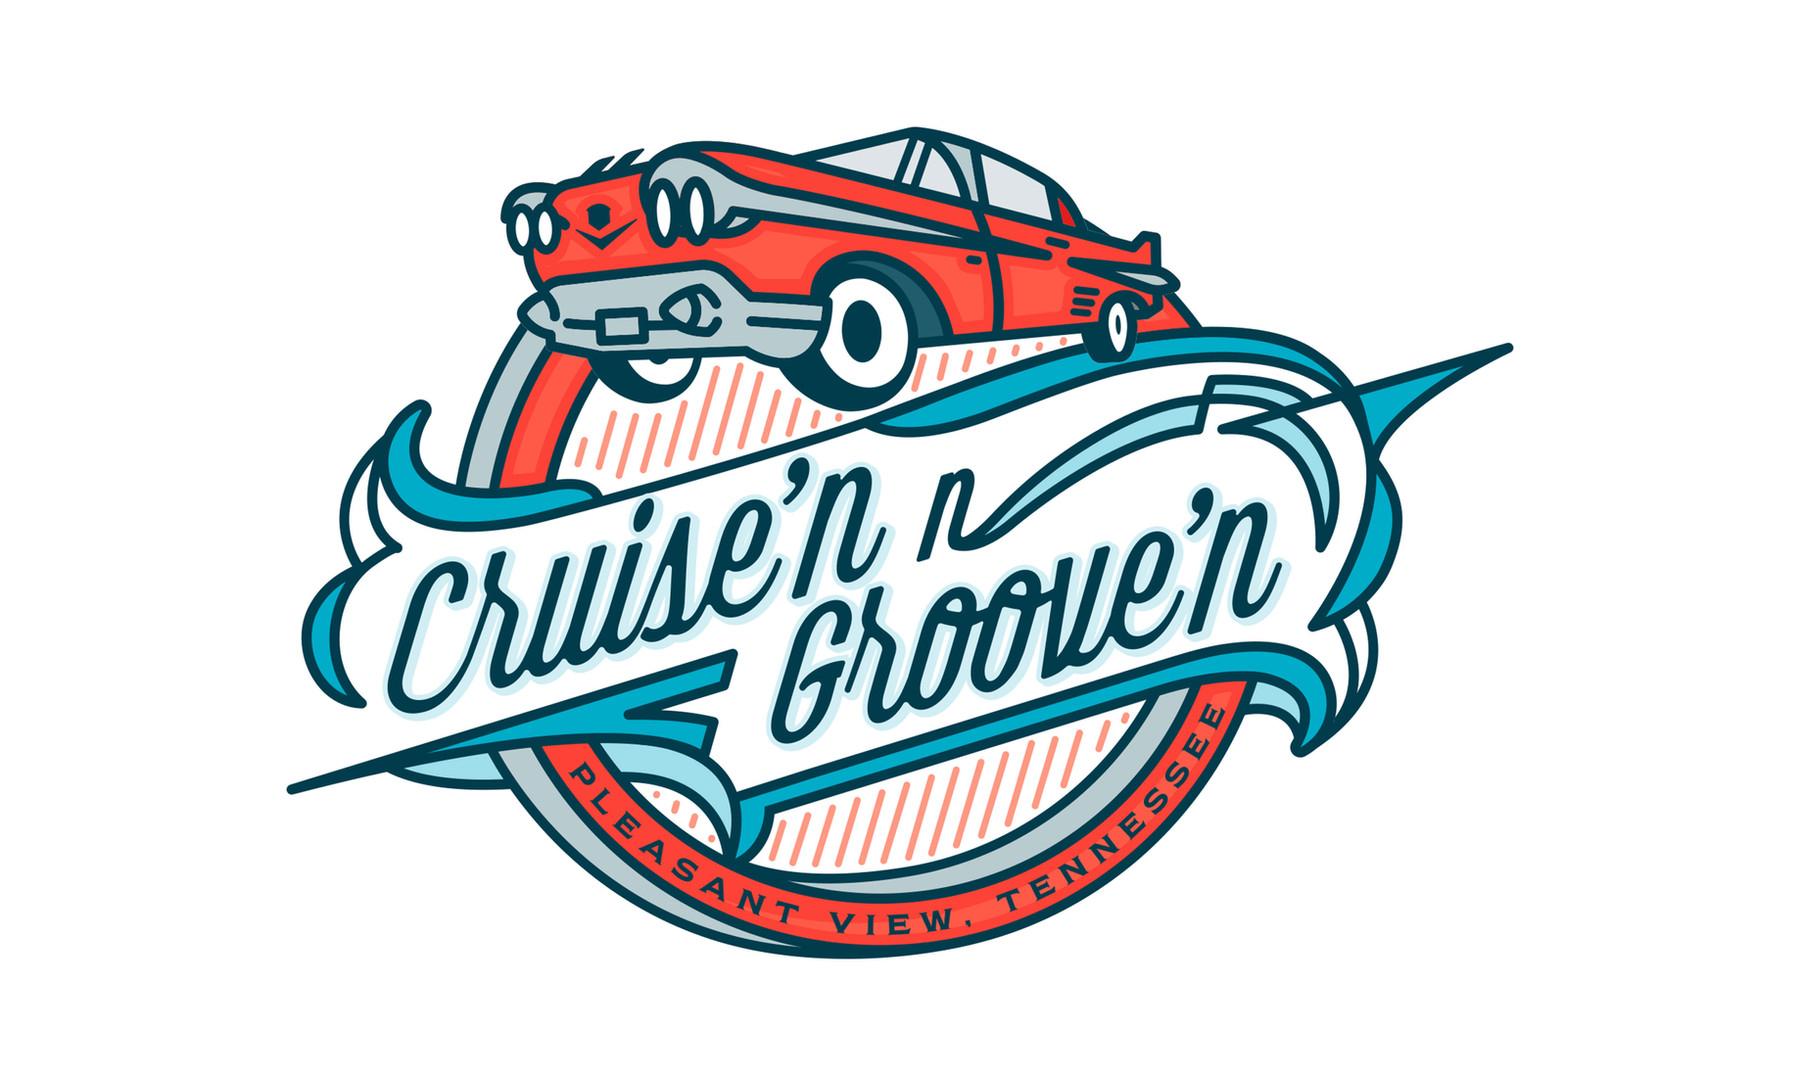 Logo Design for Cruise'n N Groove'n (Pleasant View, TN)